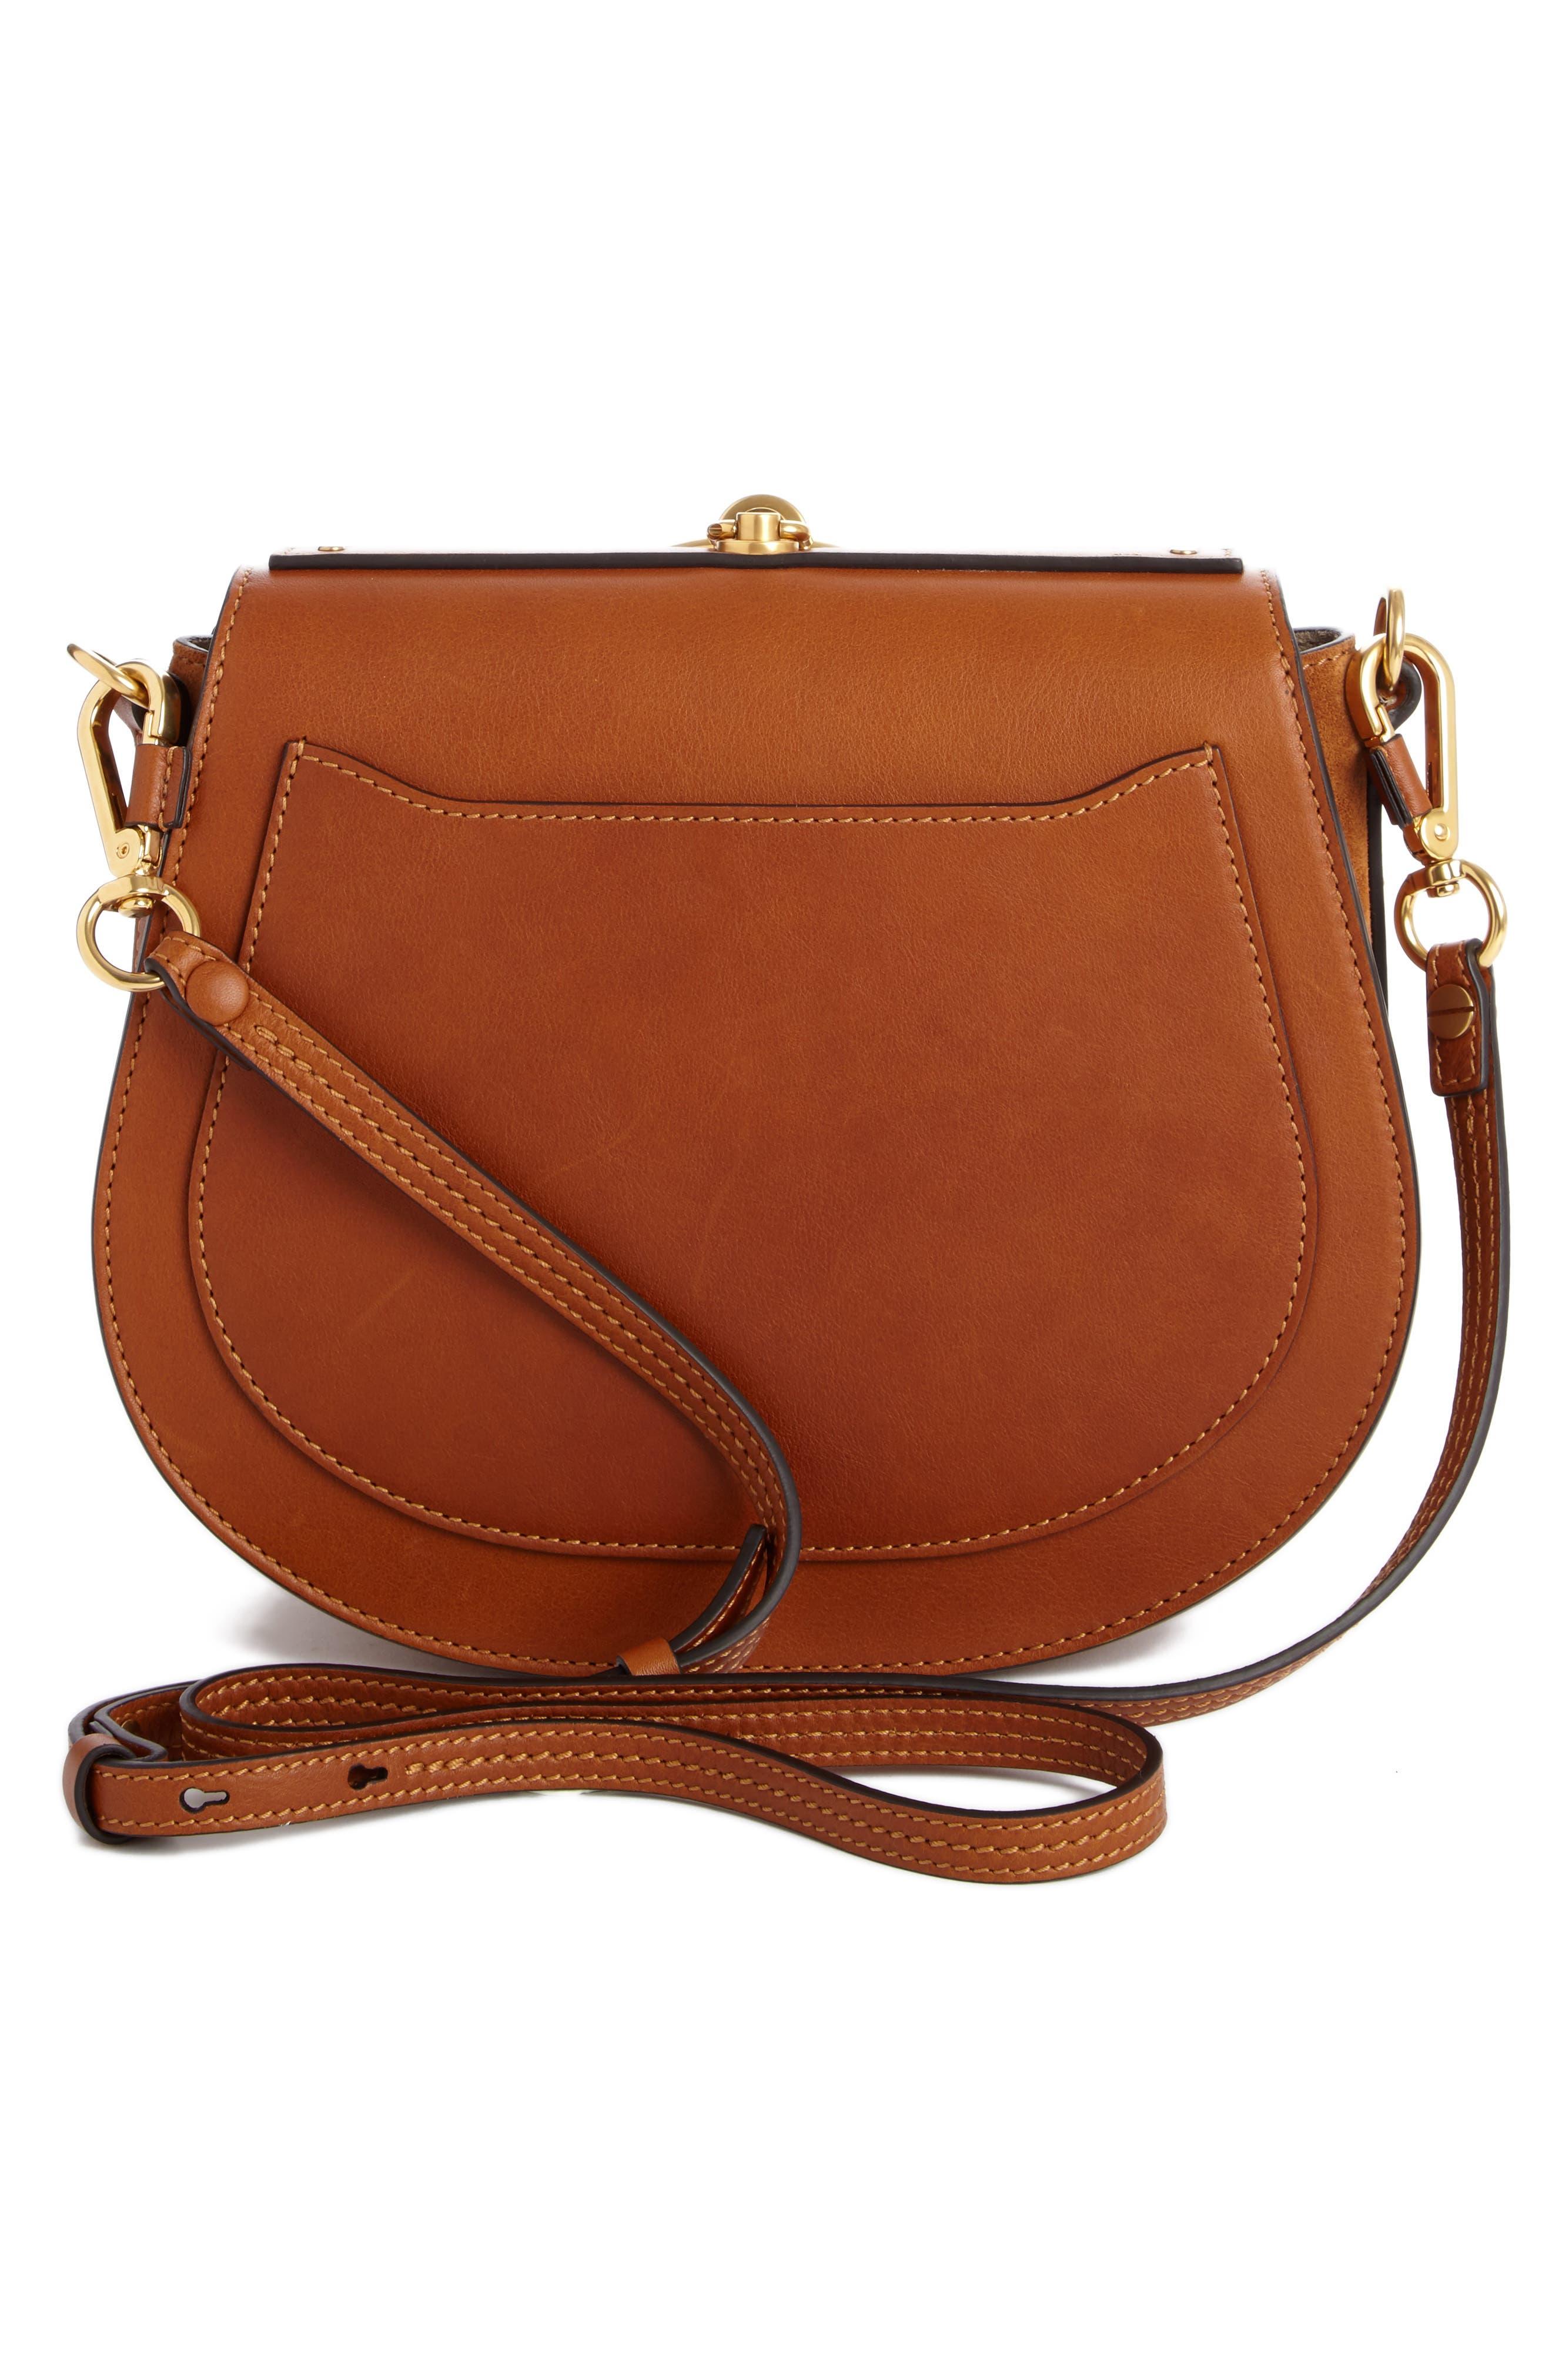 Medium Nile Leather Bracelet Saddle Bag,                             Alternate thumbnail 2, color,                             Bdu Caramel